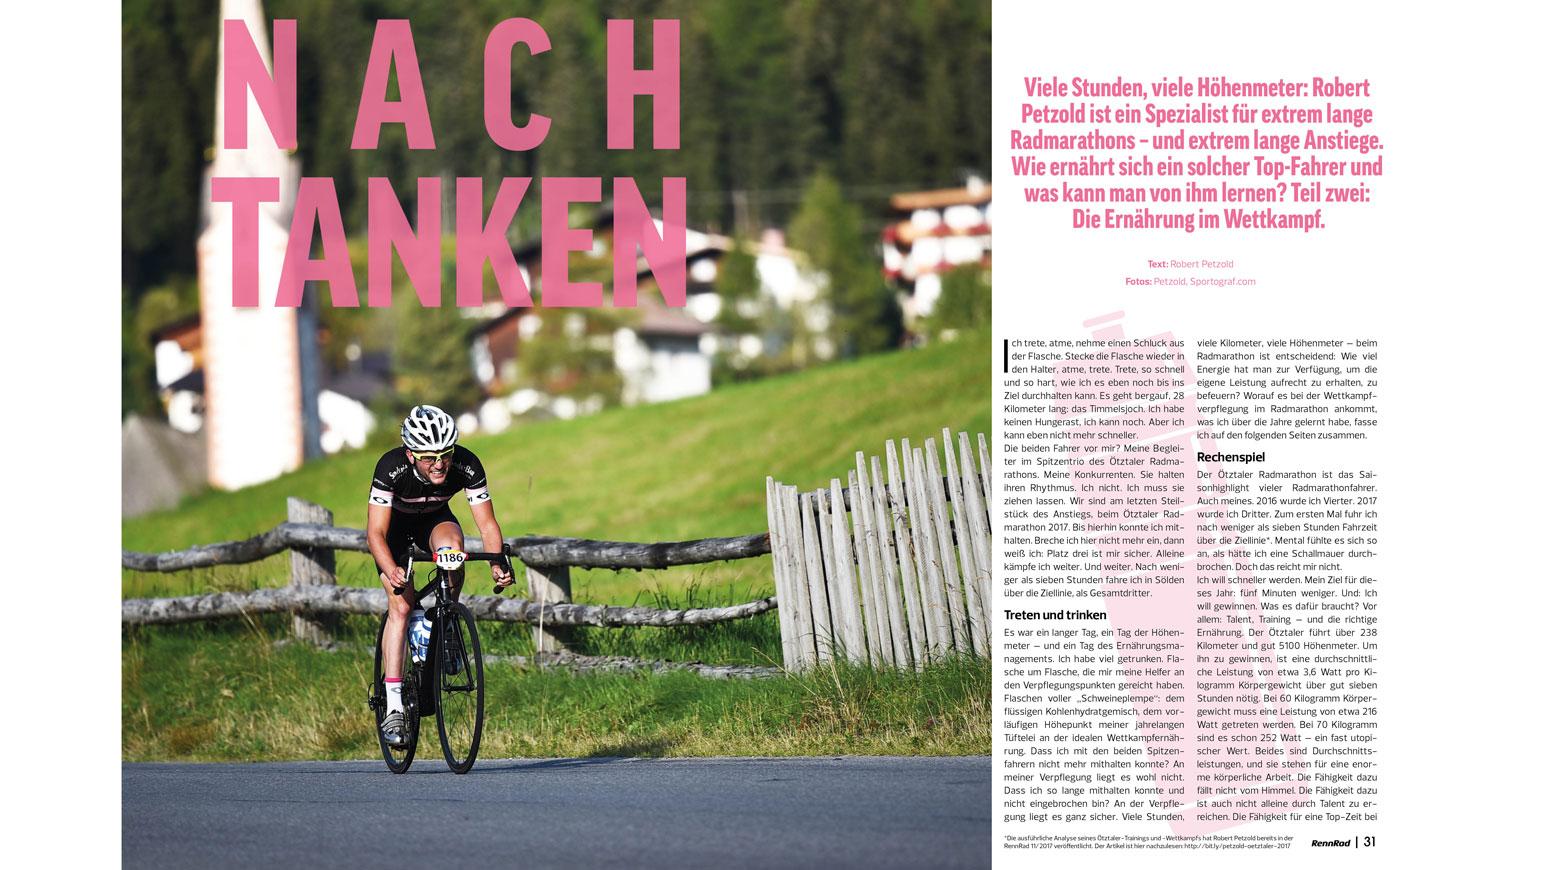 Robert-Petzold-Radsport